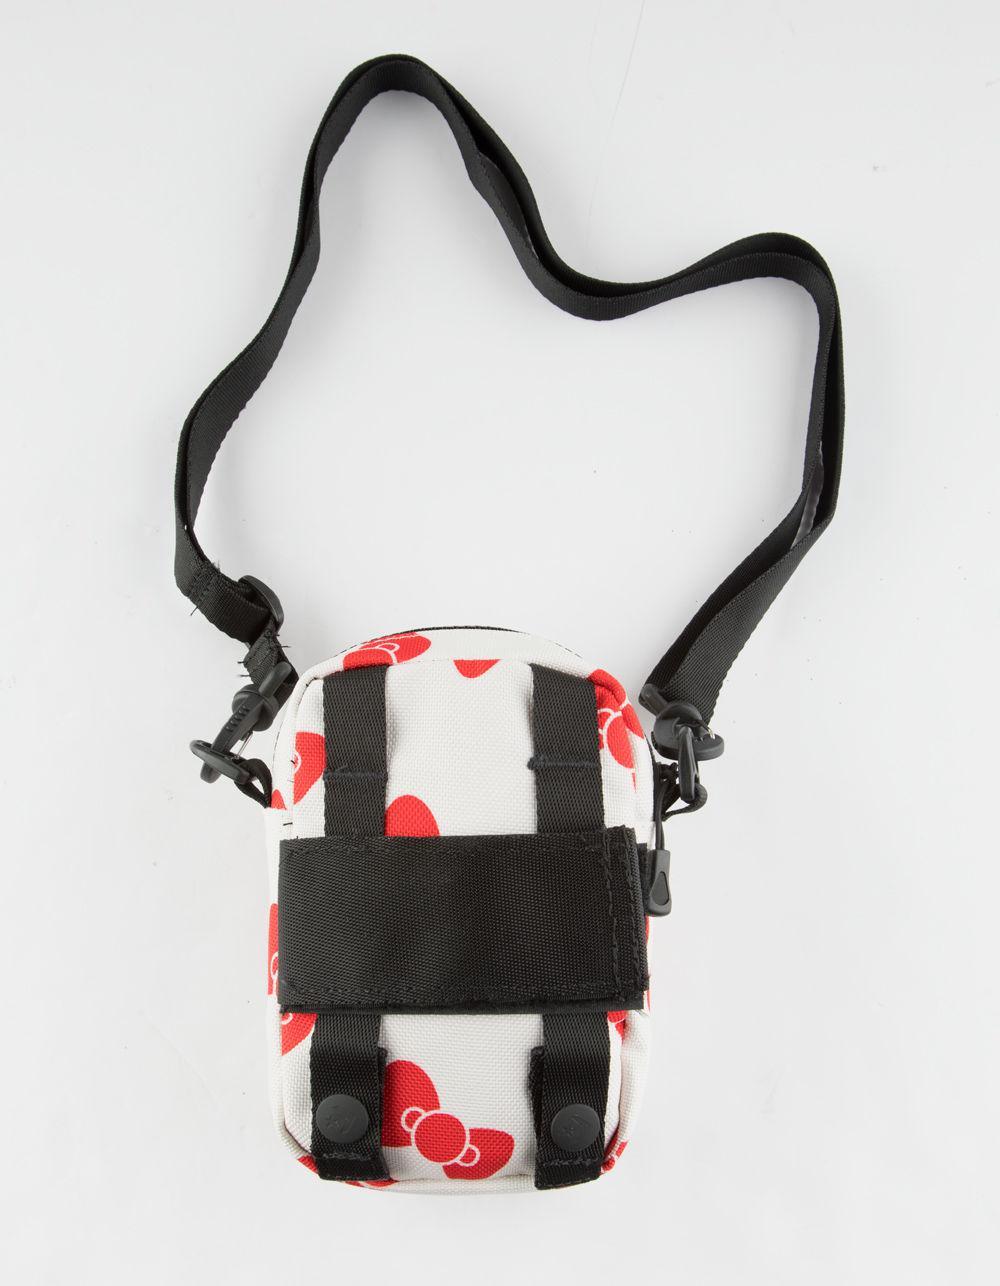 dd301591f0 Lyst - Converse X Hello Kitty White Mini Crossbody Bag in White